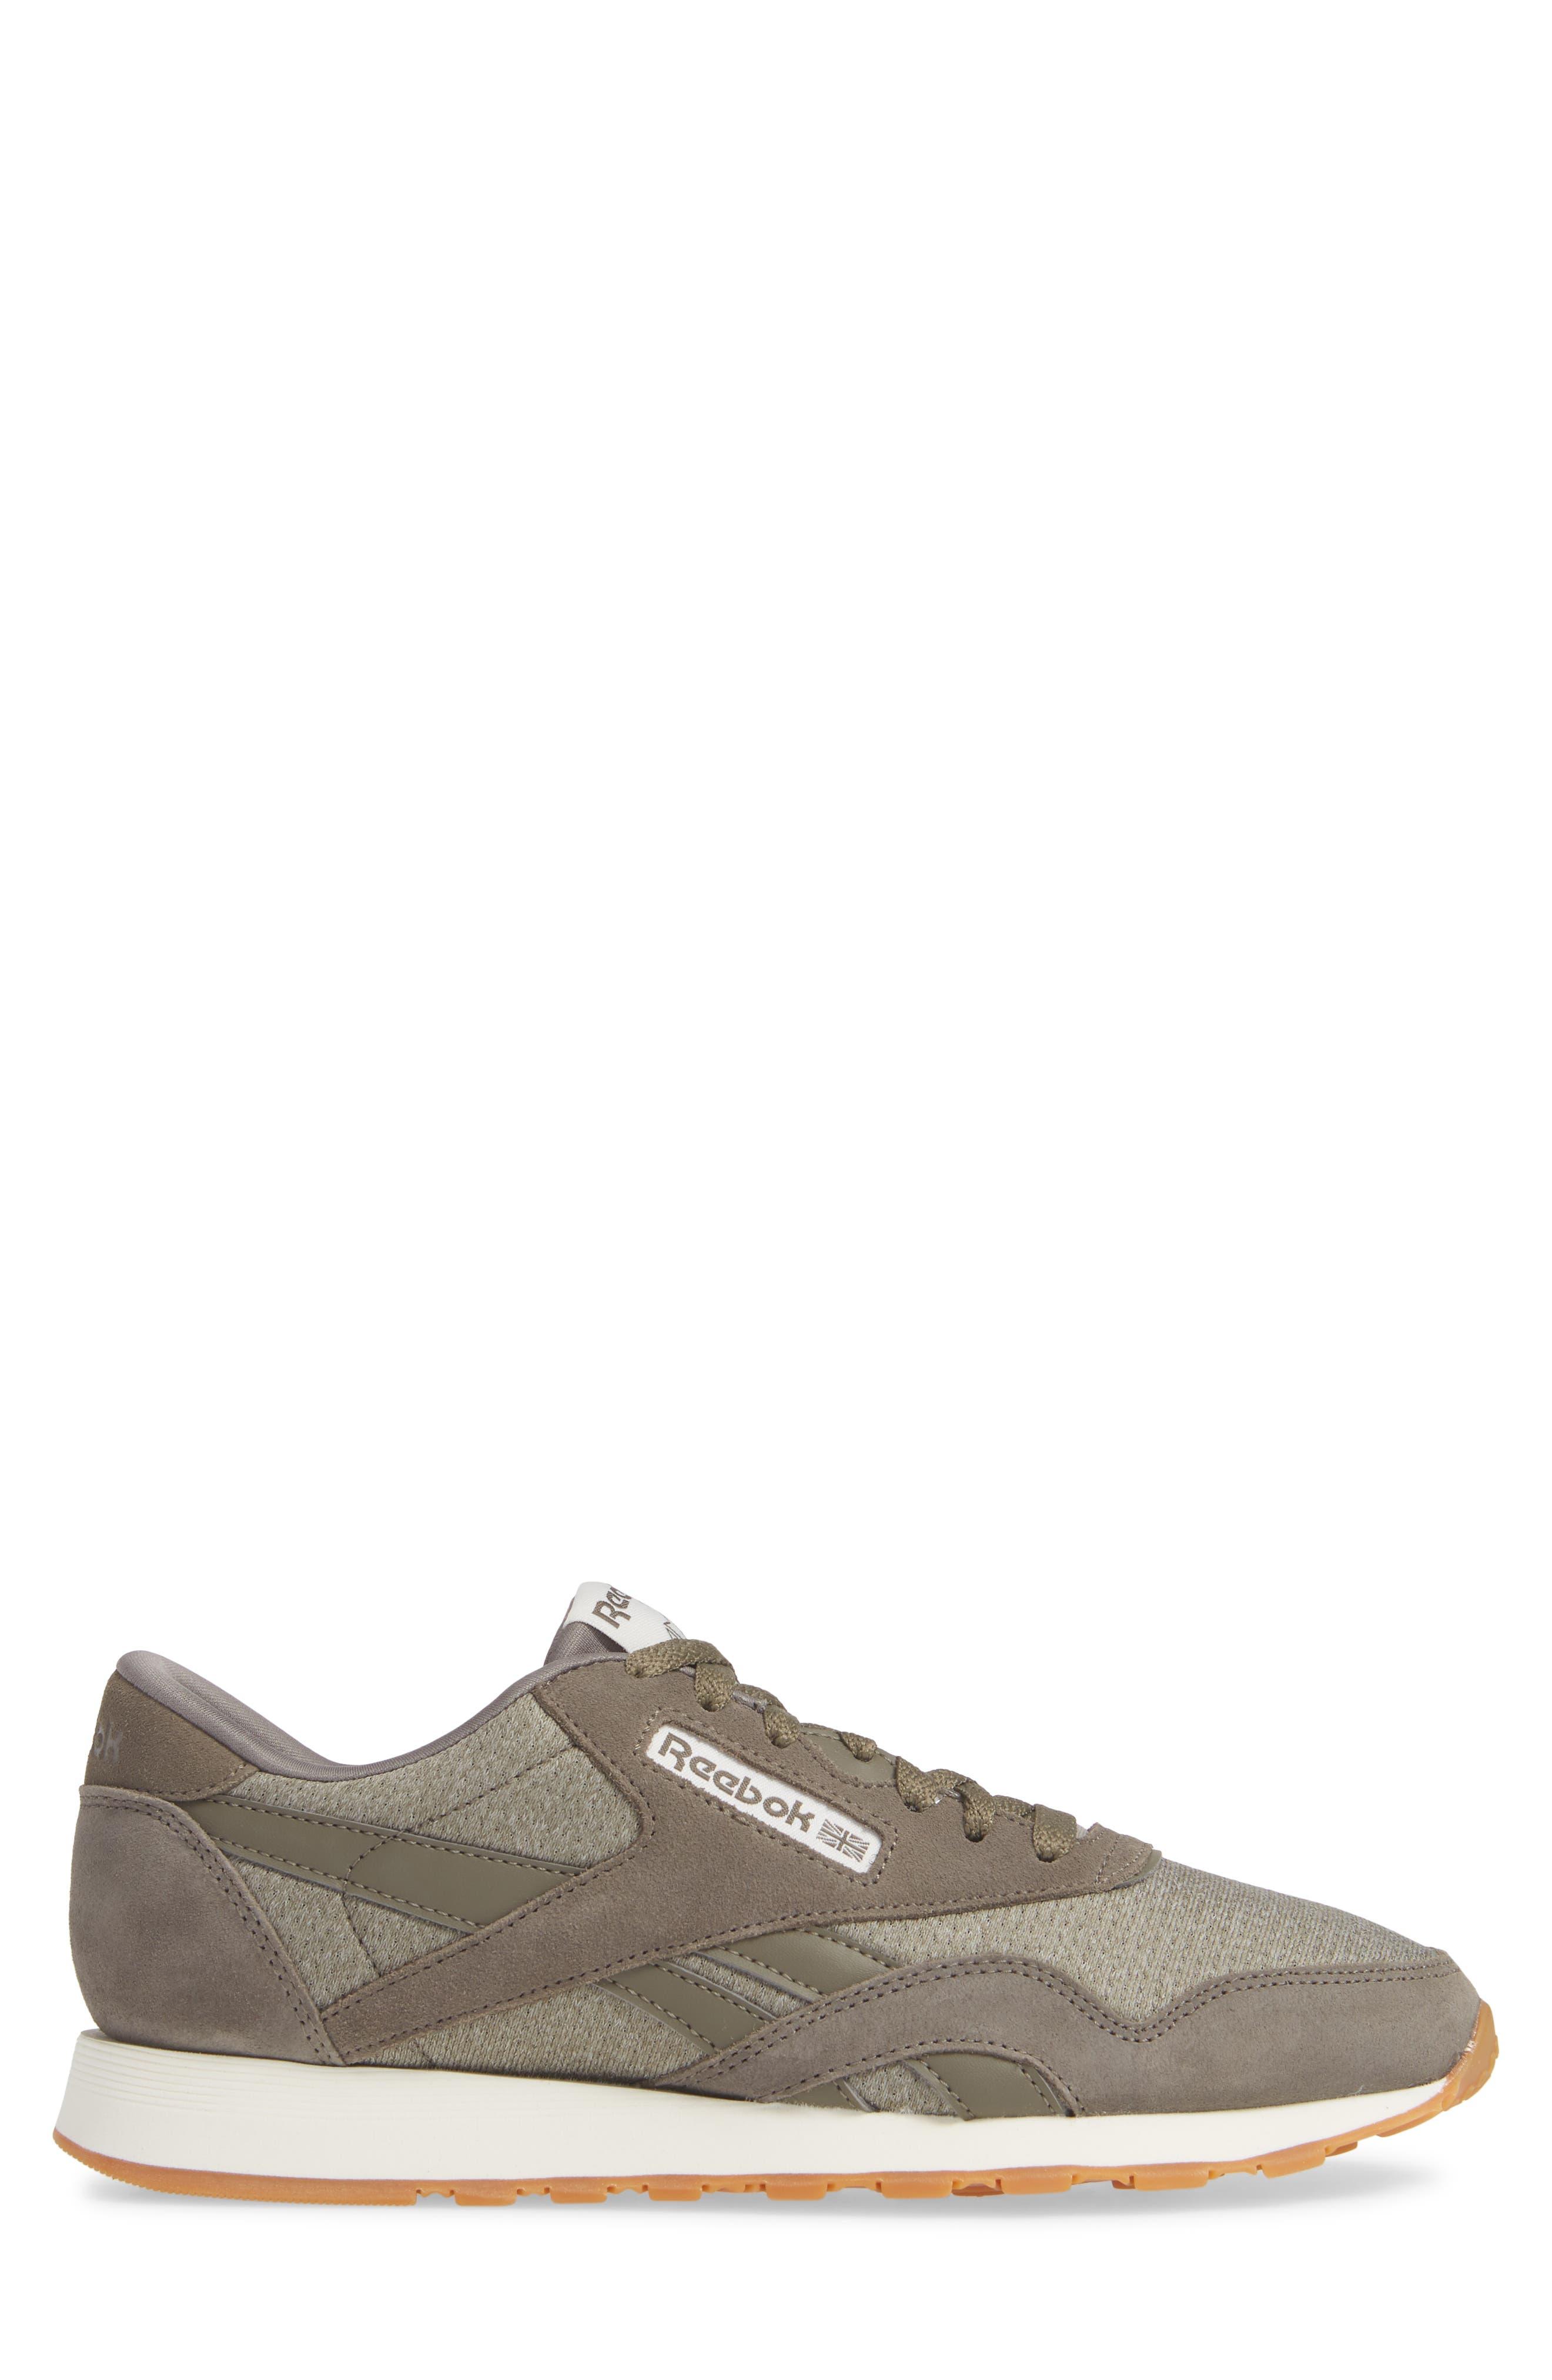 Classic Leather Nylon SG Sneaker,                             Alternate thumbnail 3, color,                             TERRAIN GREY/ CHALK